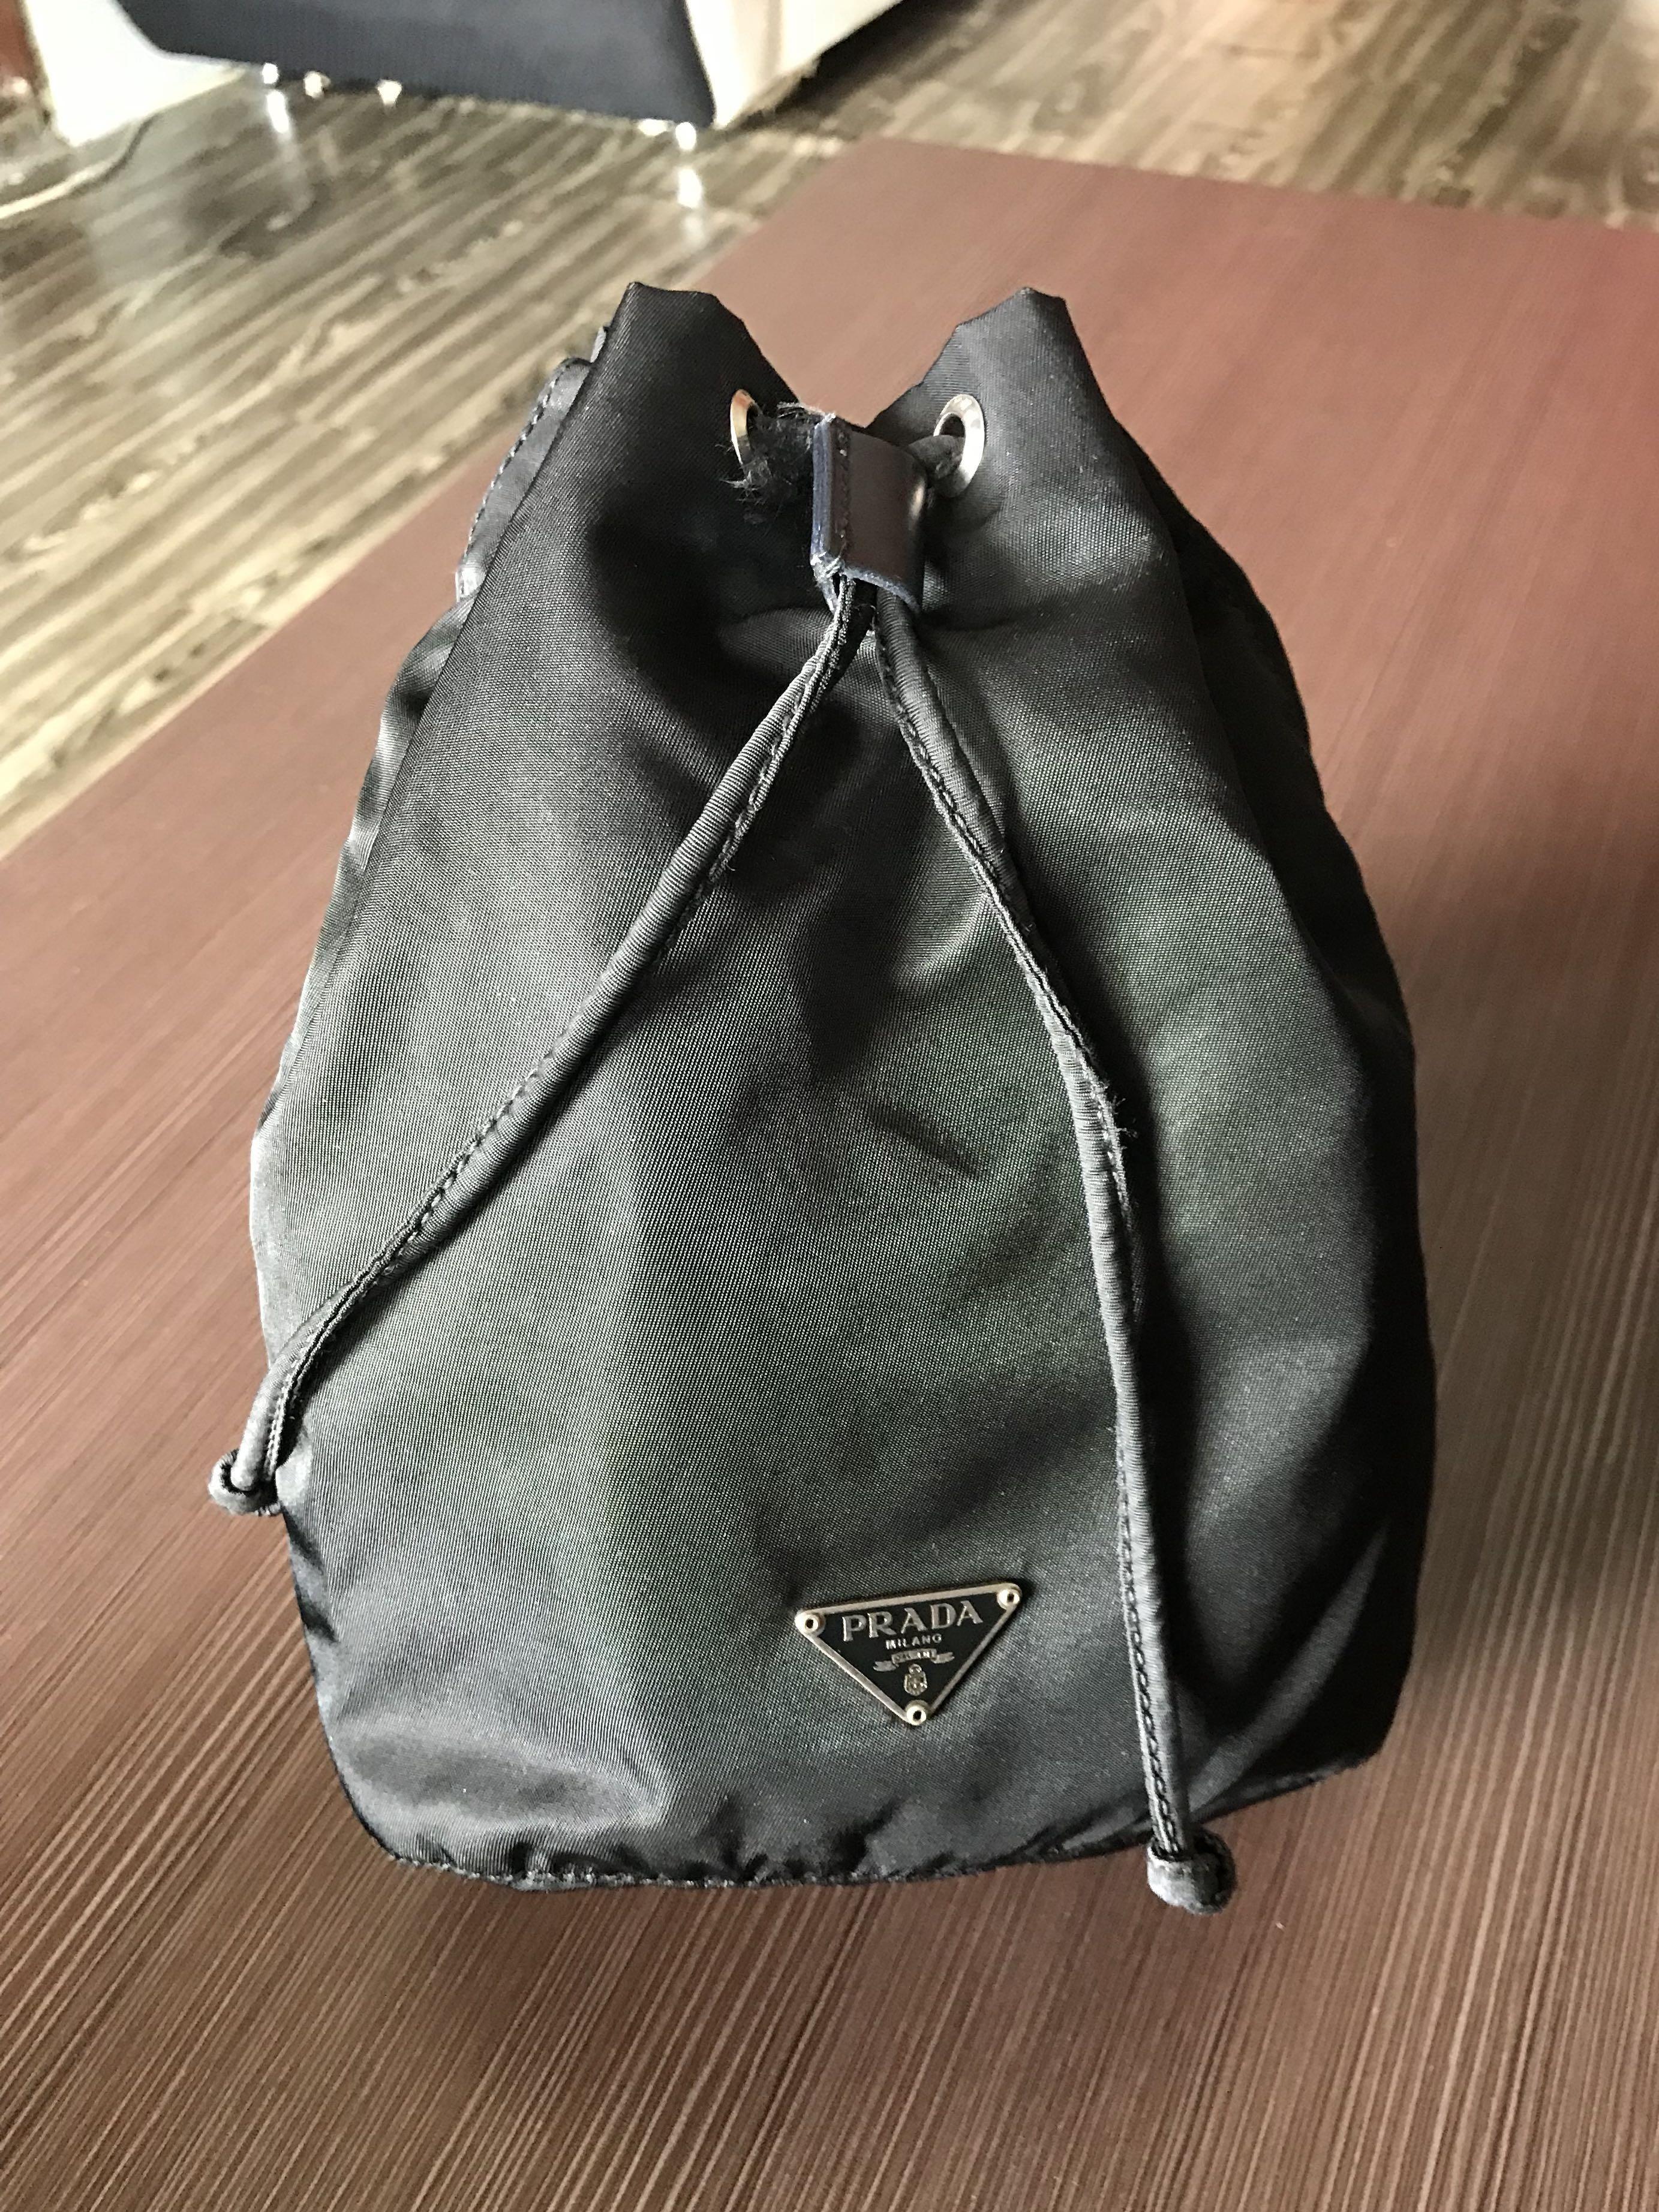 3e9cbb1e974a Authentic Prada Bucket Bag, Luxury, Bags & Wallets on Carousell